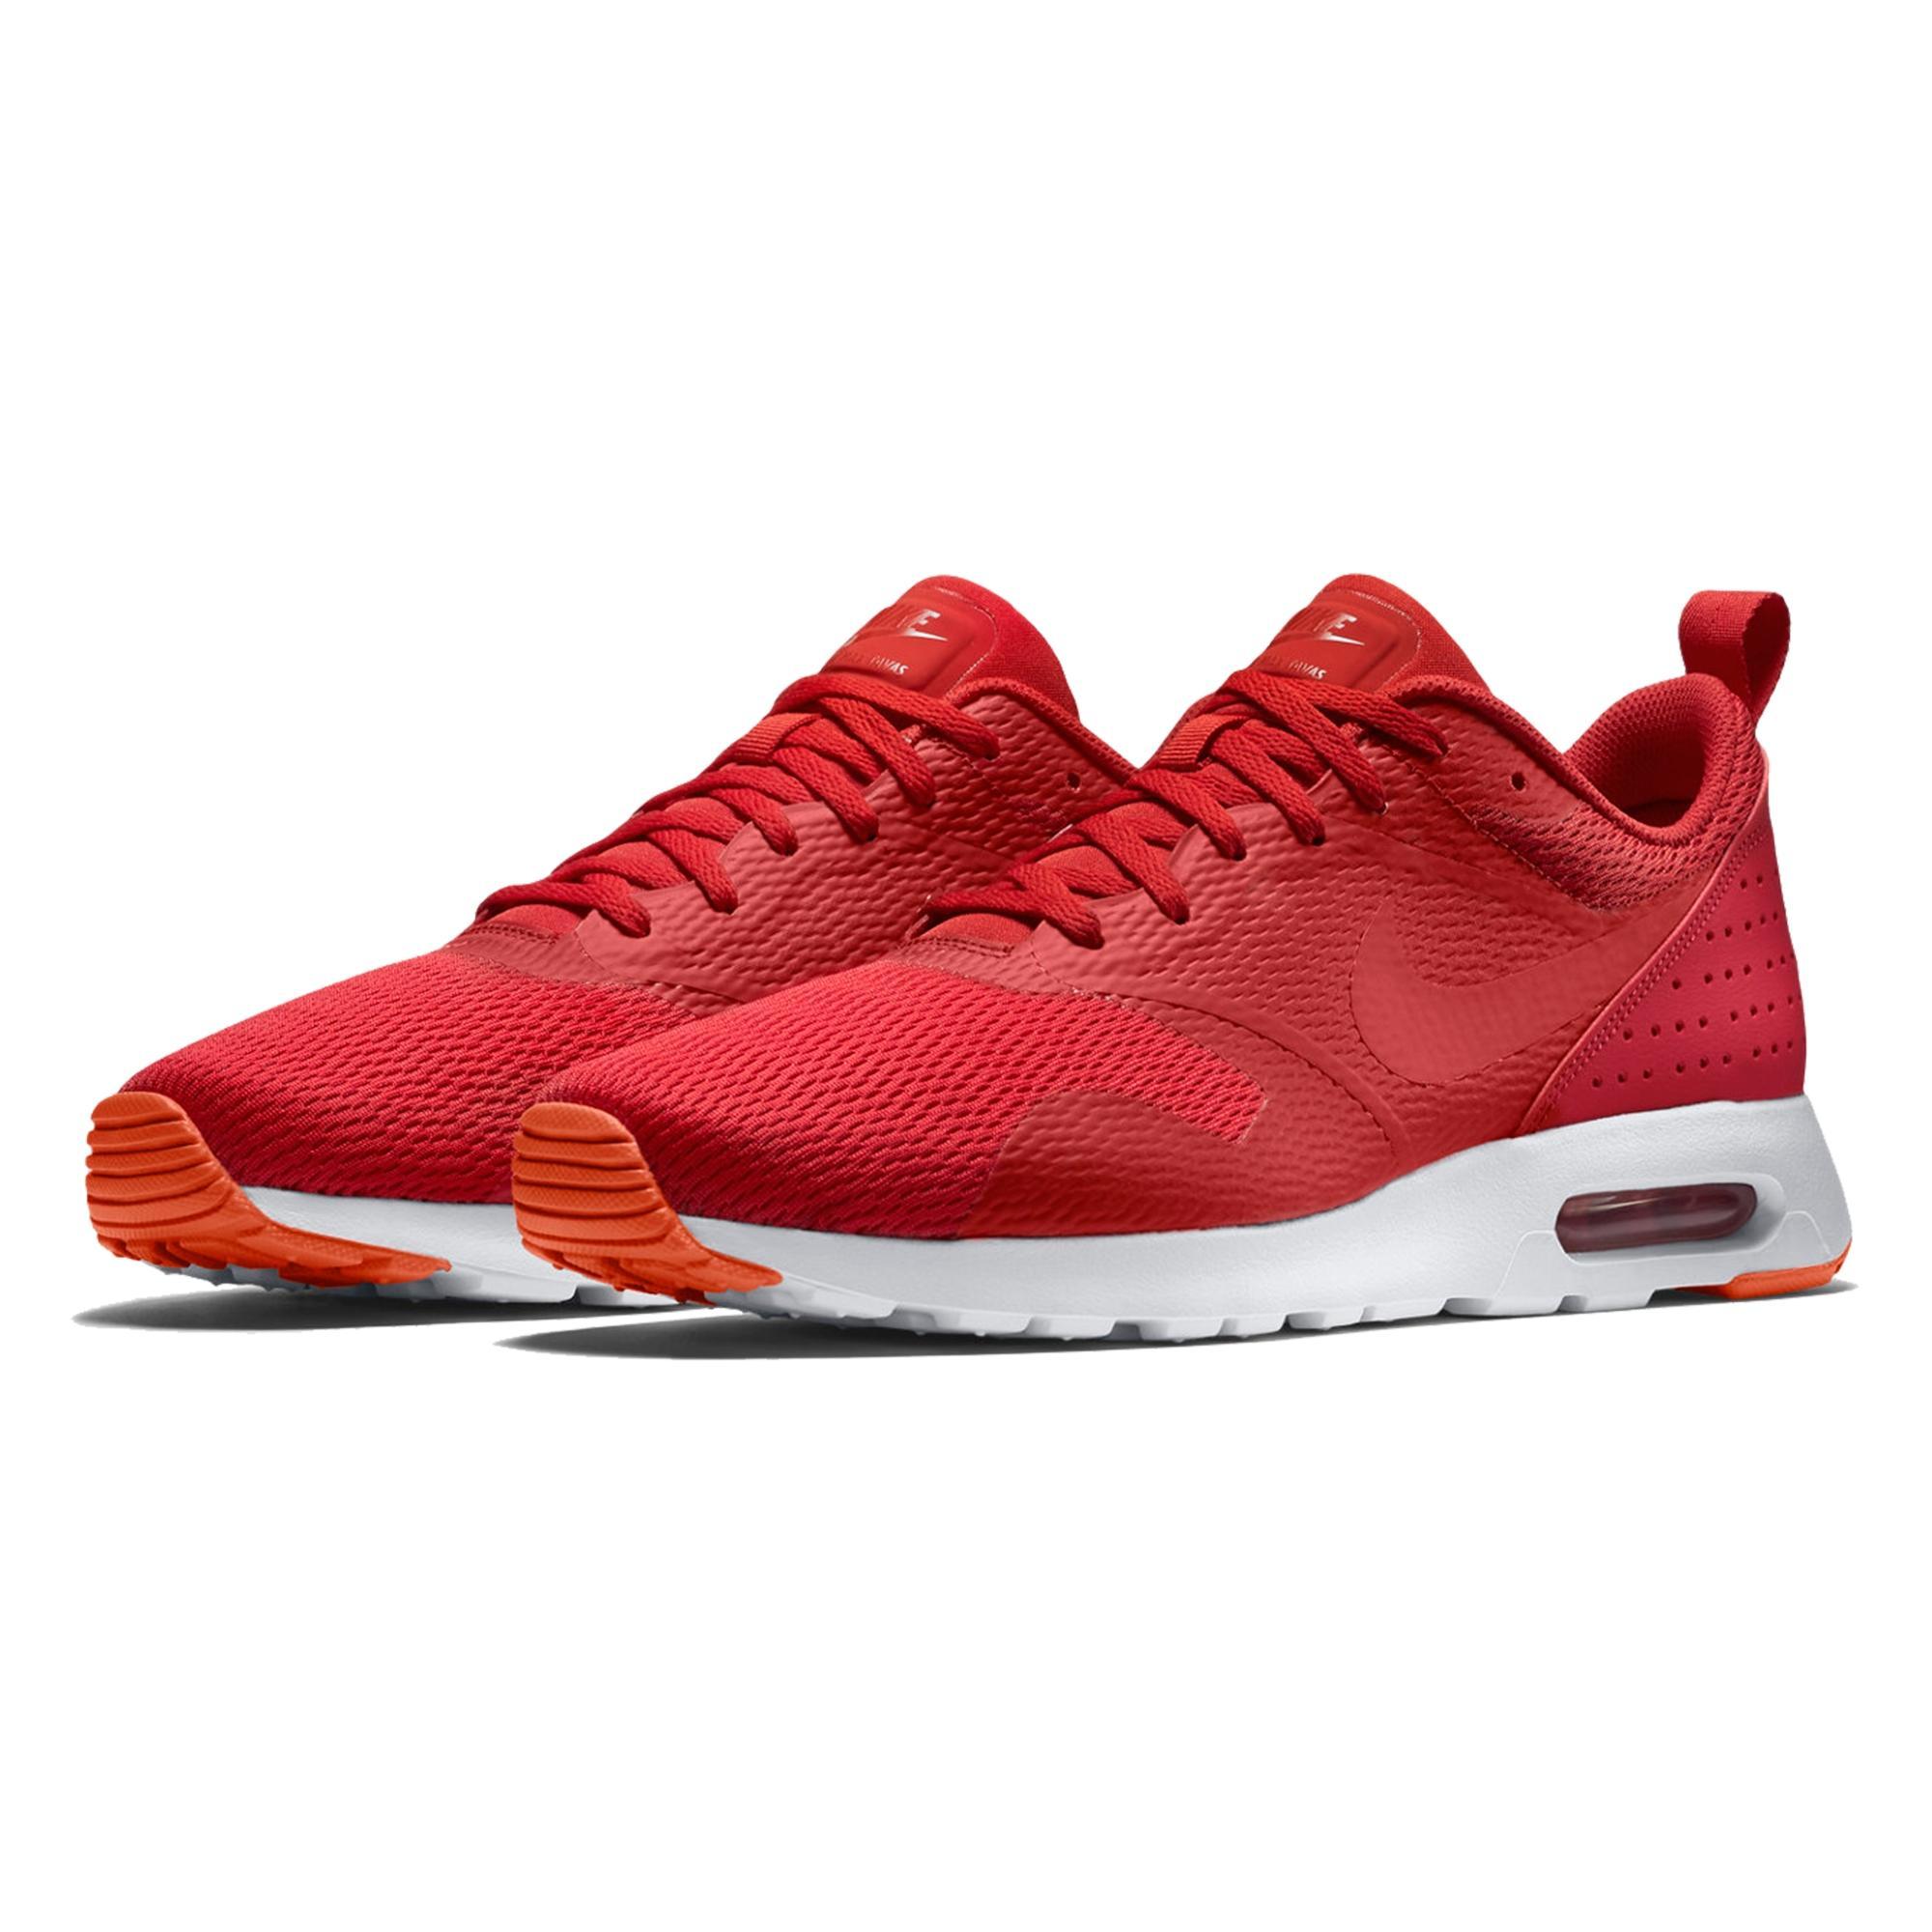 online store 31f04 62eeb Nike Air Max Tavas SS16 Erkek Spor Ayakkabı